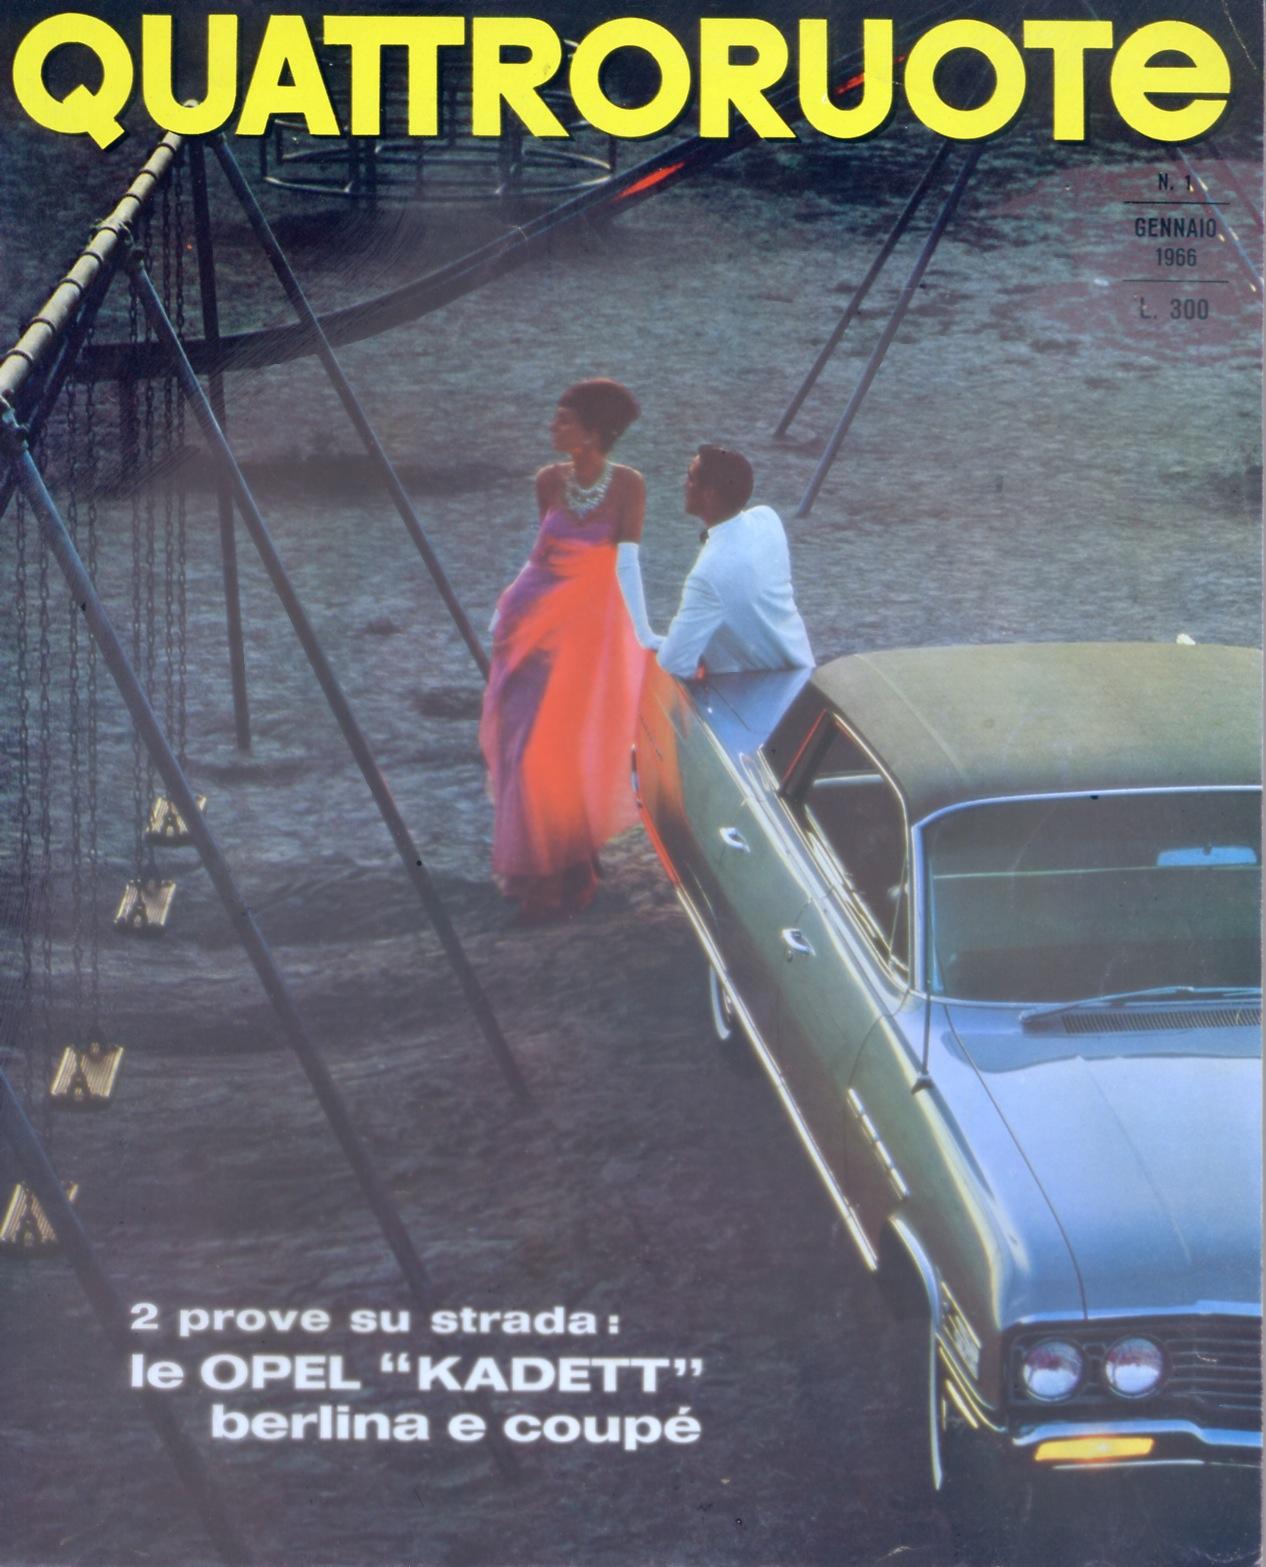 1966 quattroruote copertina gennaio 121